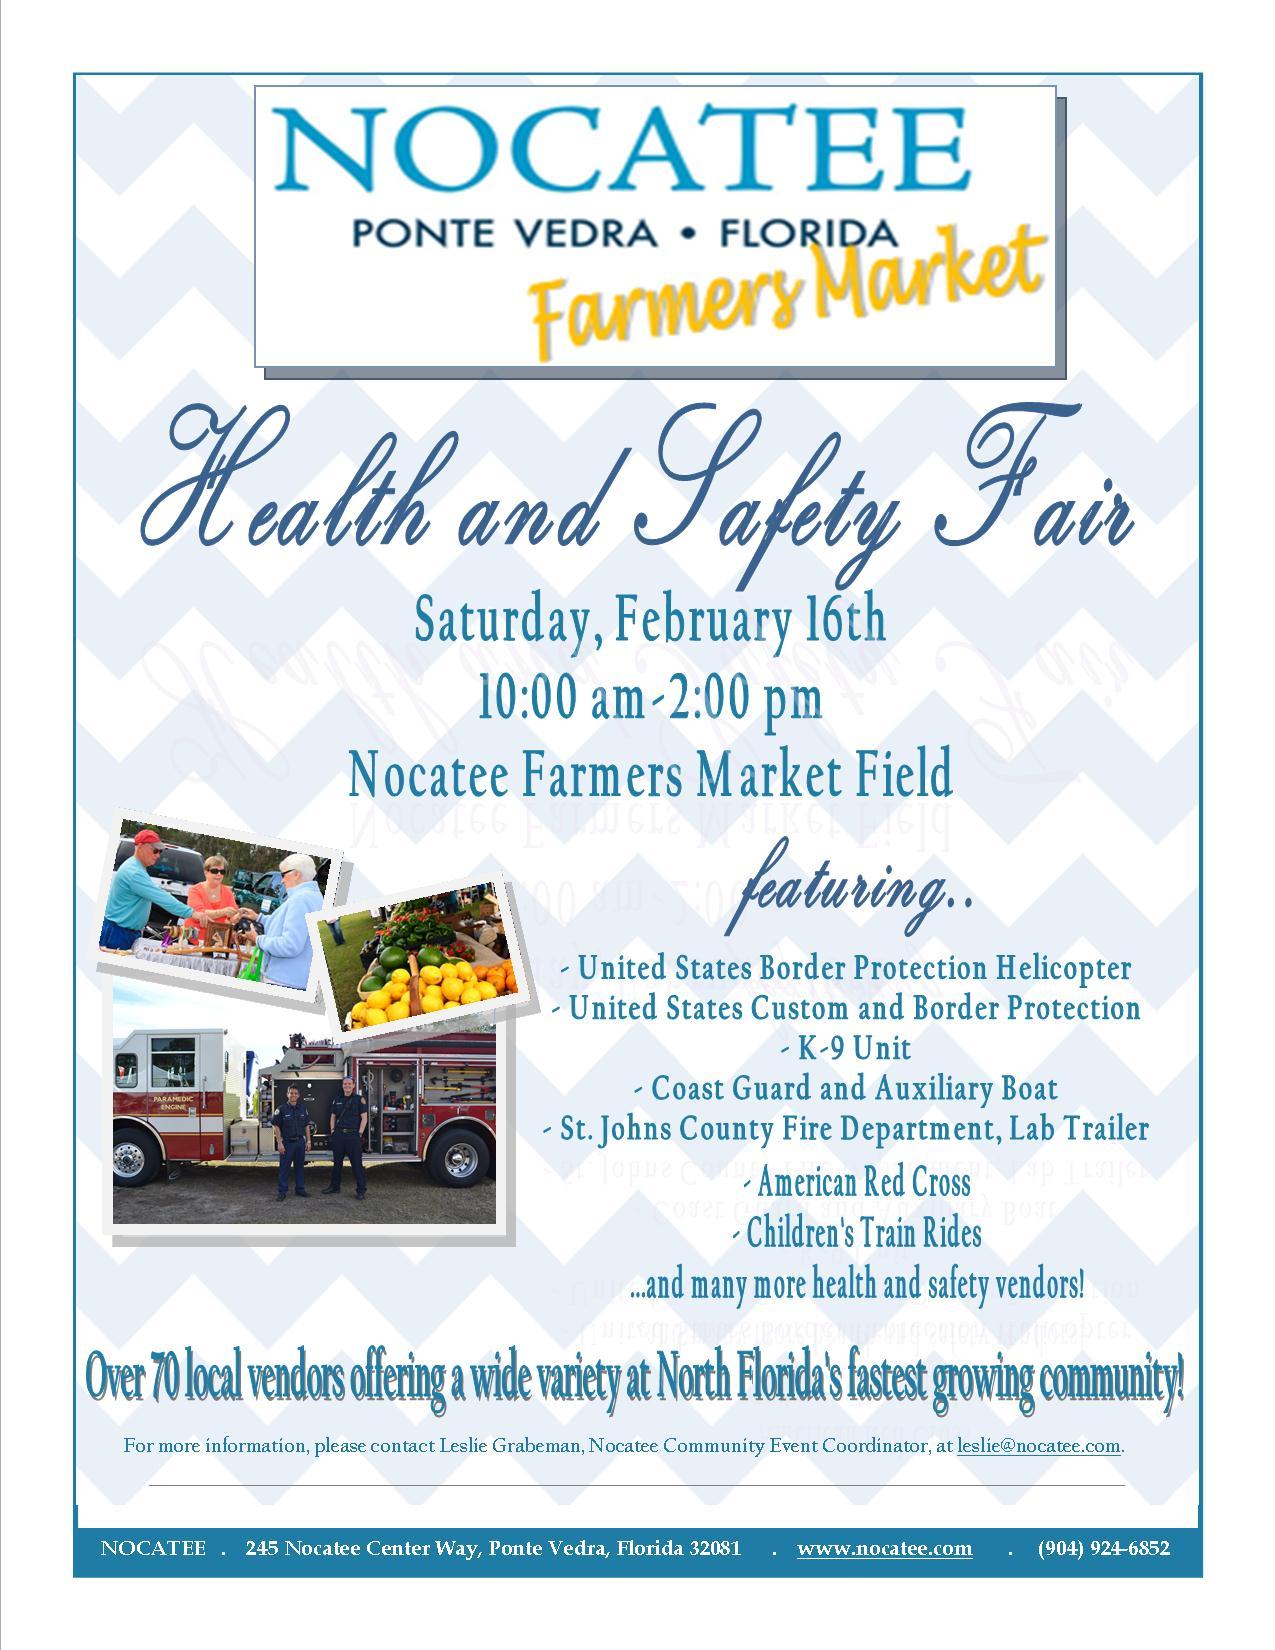 Nocatee Farmers Market event